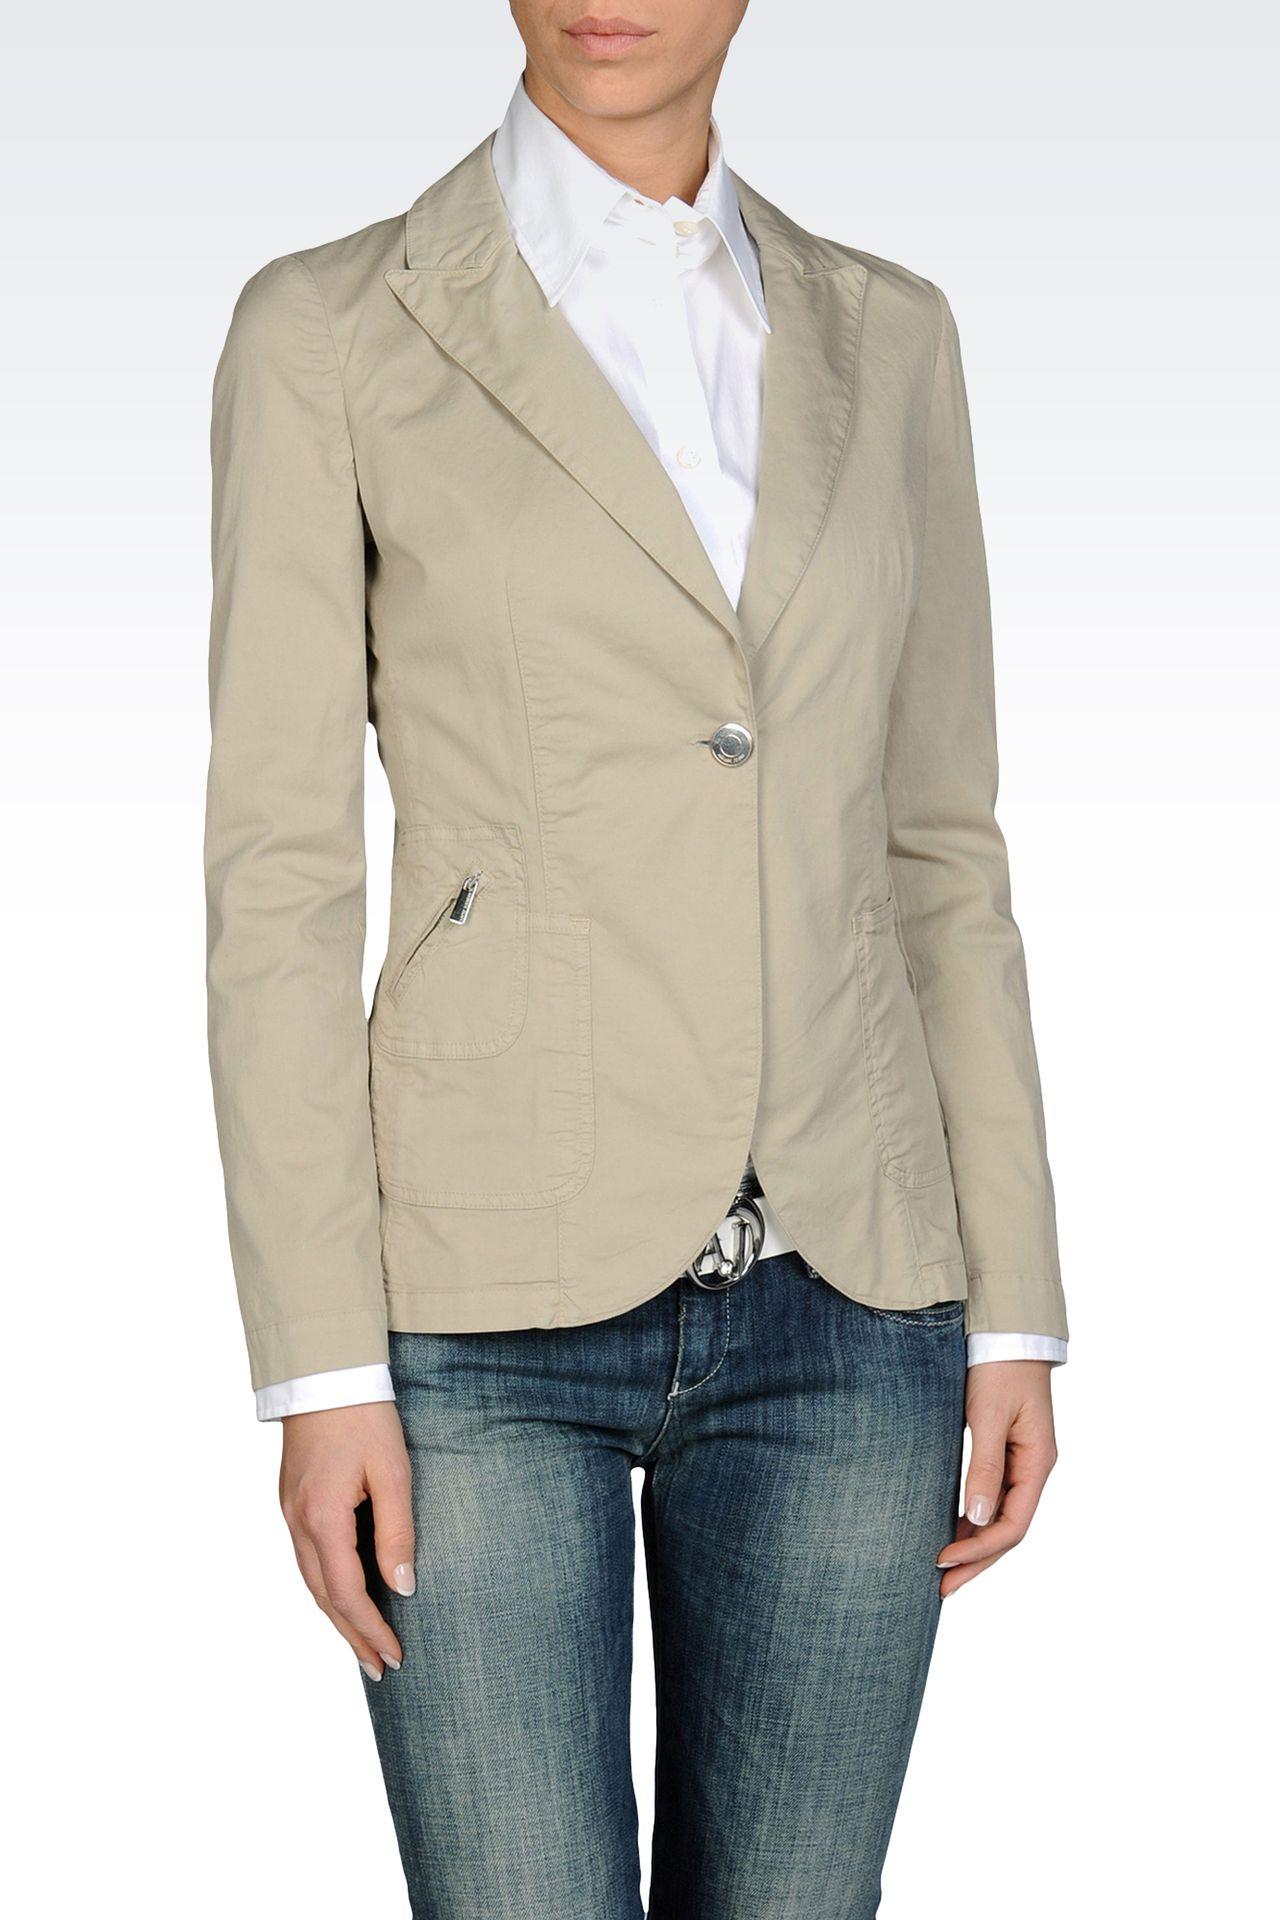 SINGLE BUTTON JACKET IN STRETCH COTTON GABARDINE: One button jackets Women by Armani - 0